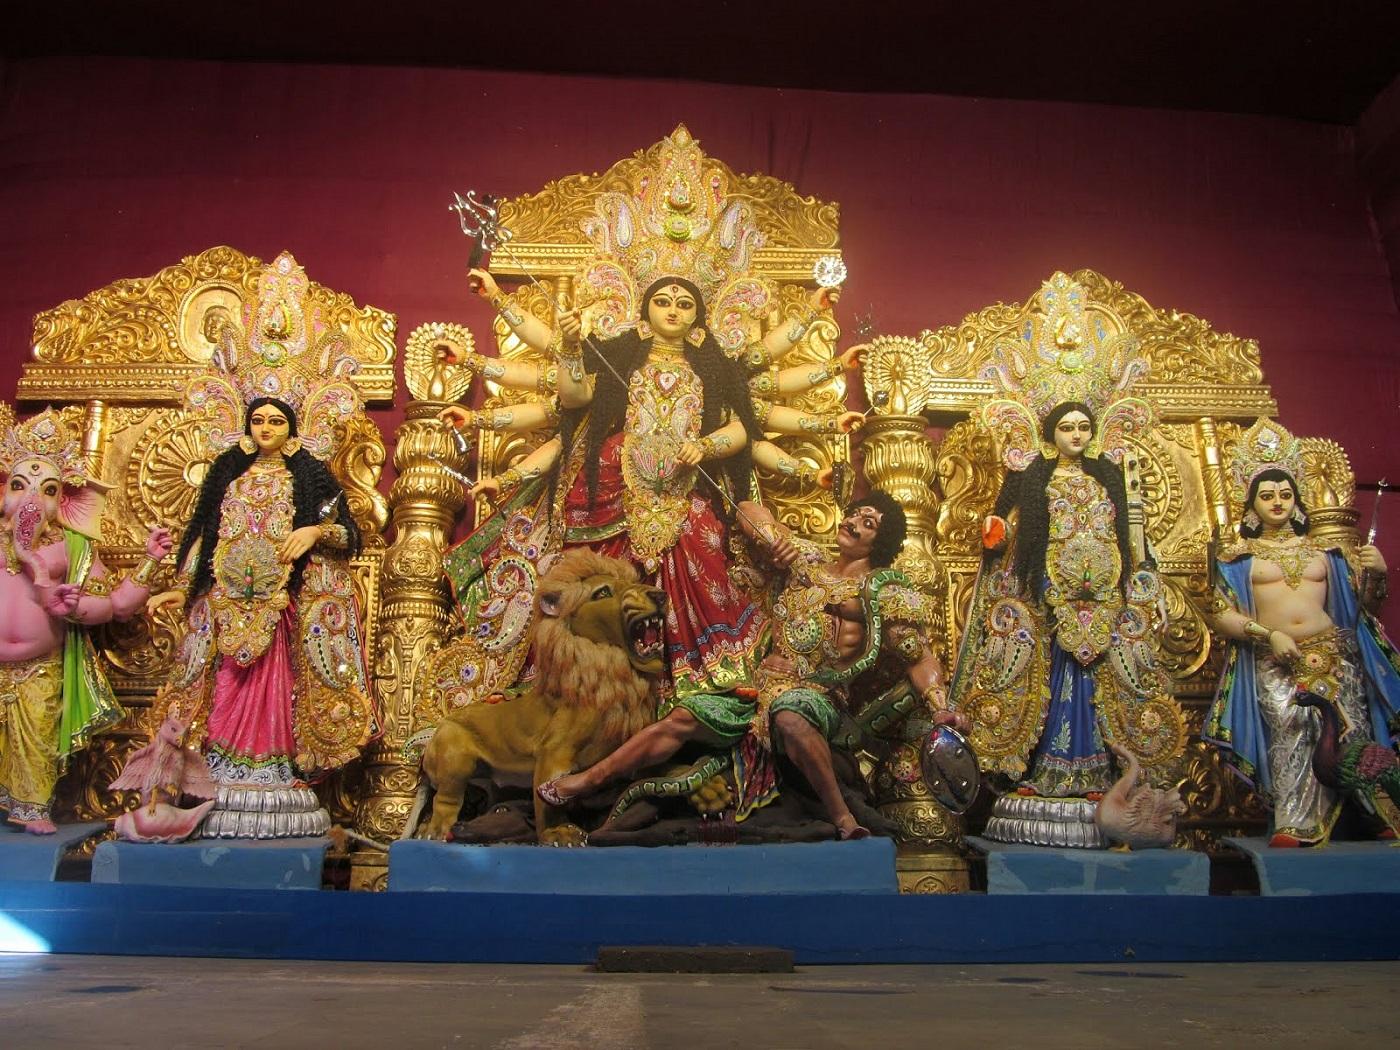 Santosh Mitra Square Durga Puja, Kolkata